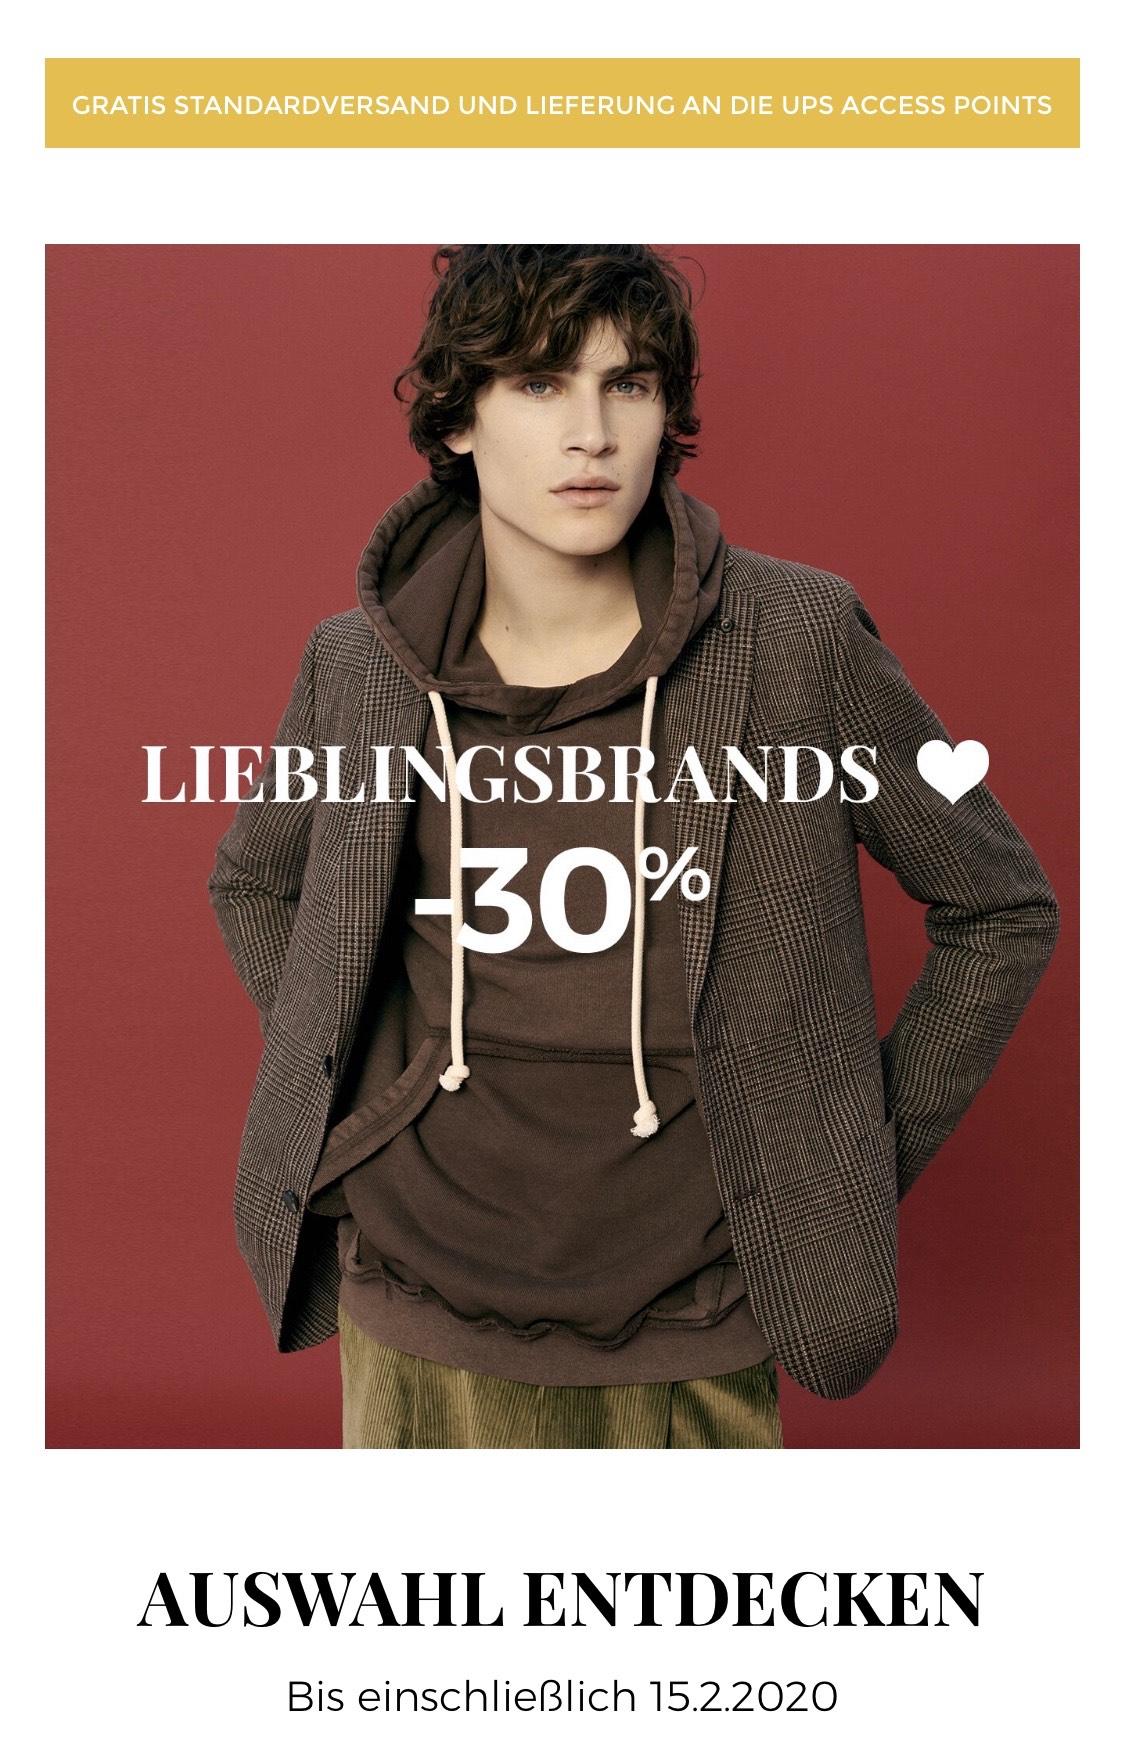 LIEBLINGSBRANDS -30% - z.B. Einfarbiges Hemd von JIL SANDER